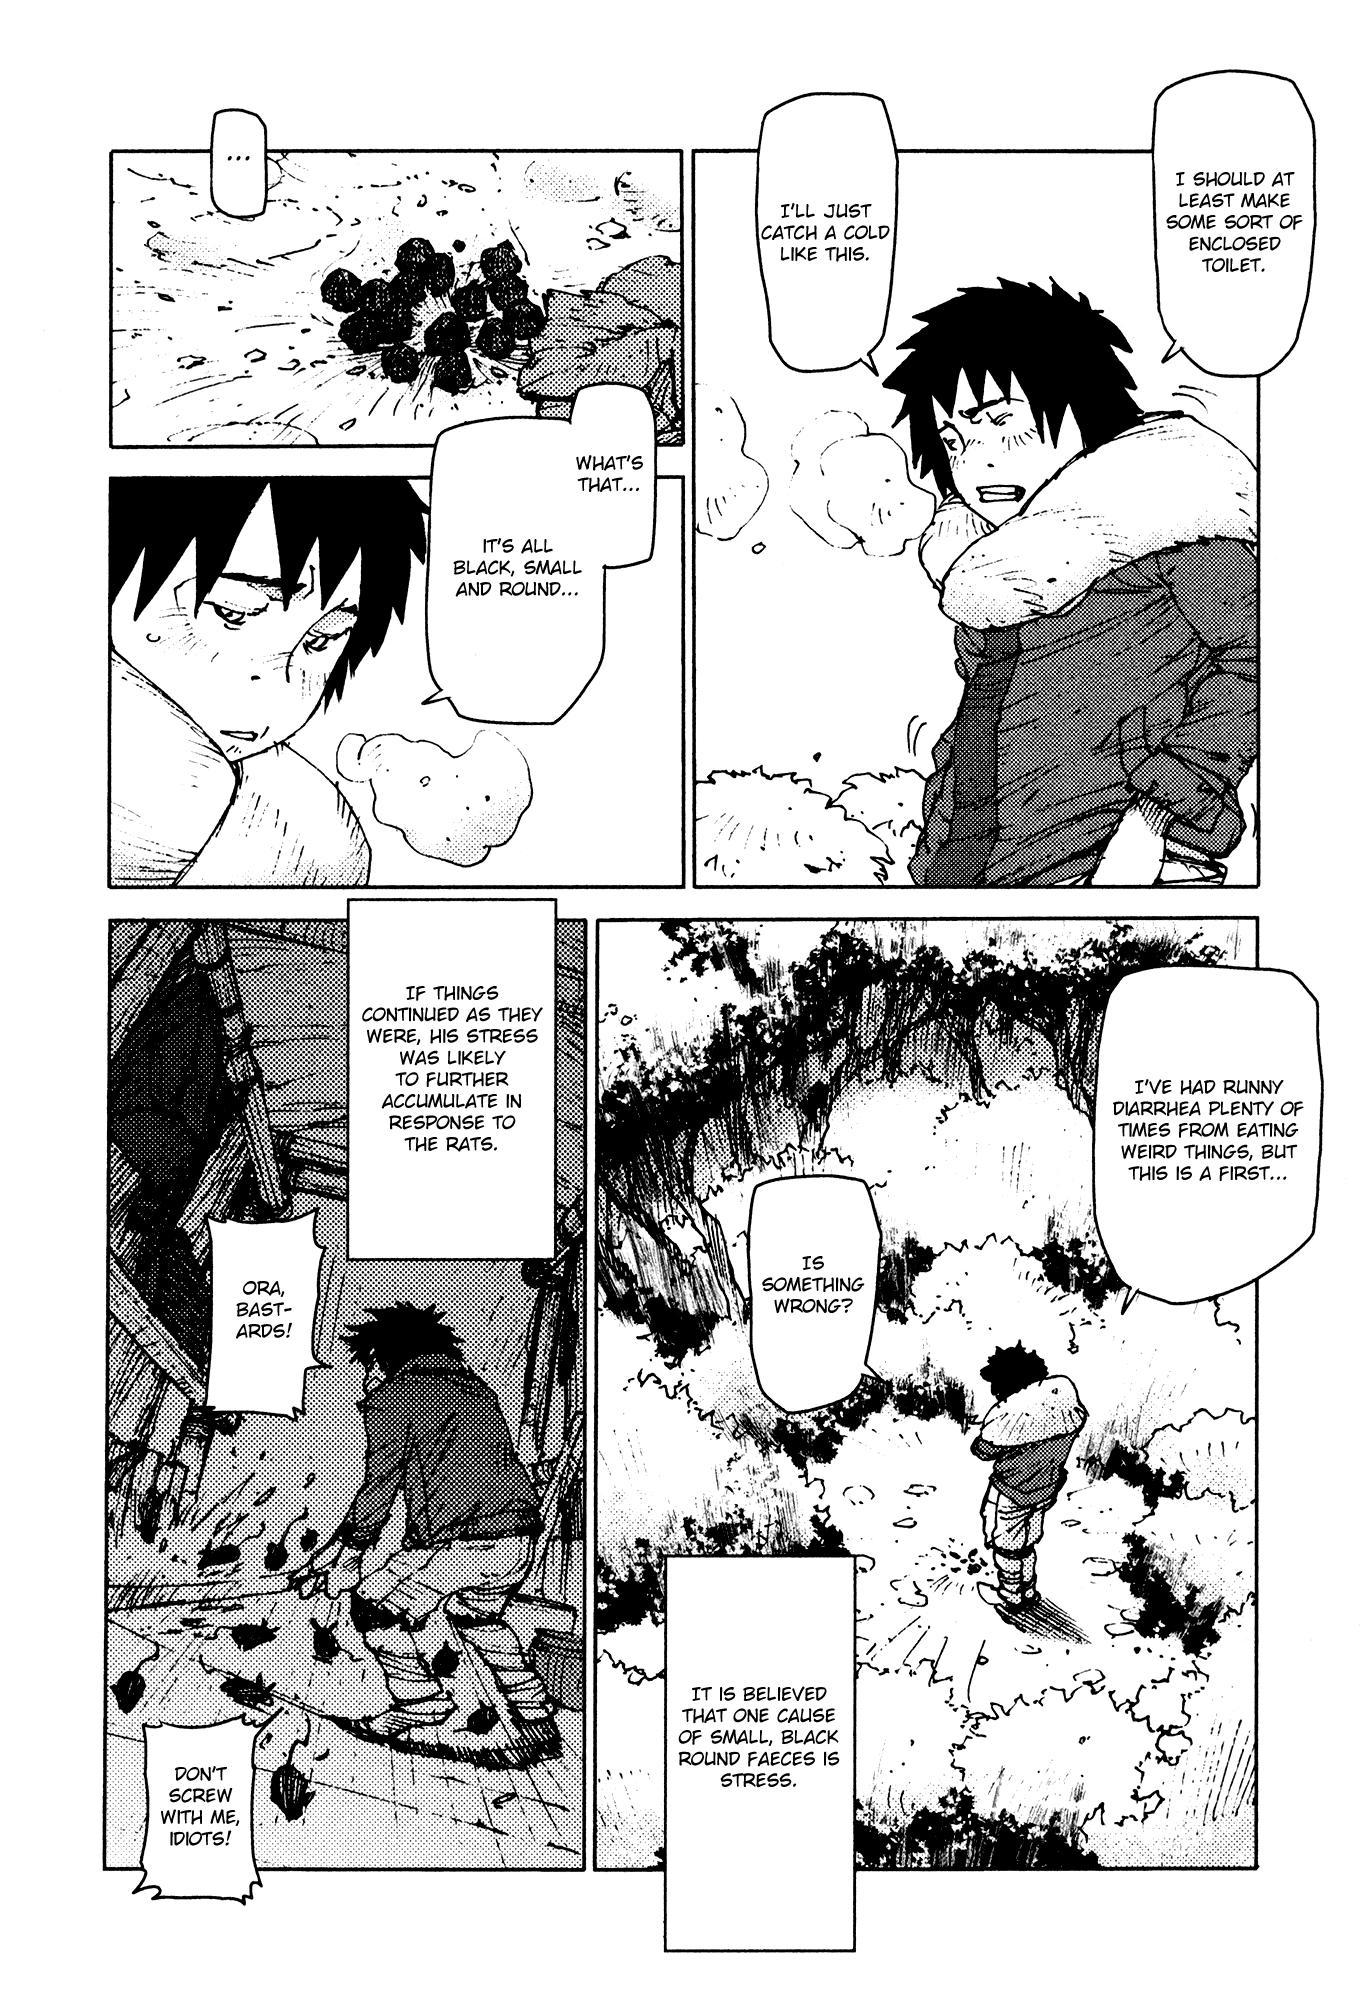 Survival: Shounen S no Kiroku - Chapter 22